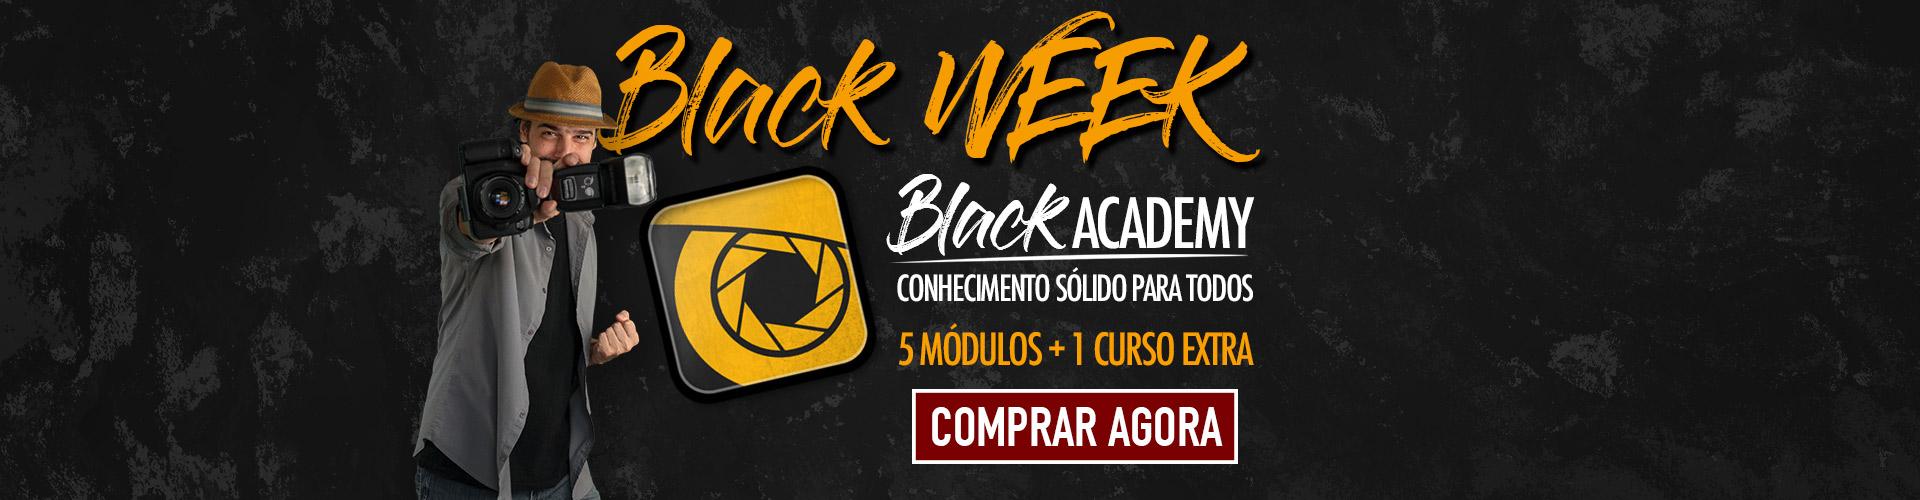 slider-black-friday-academy